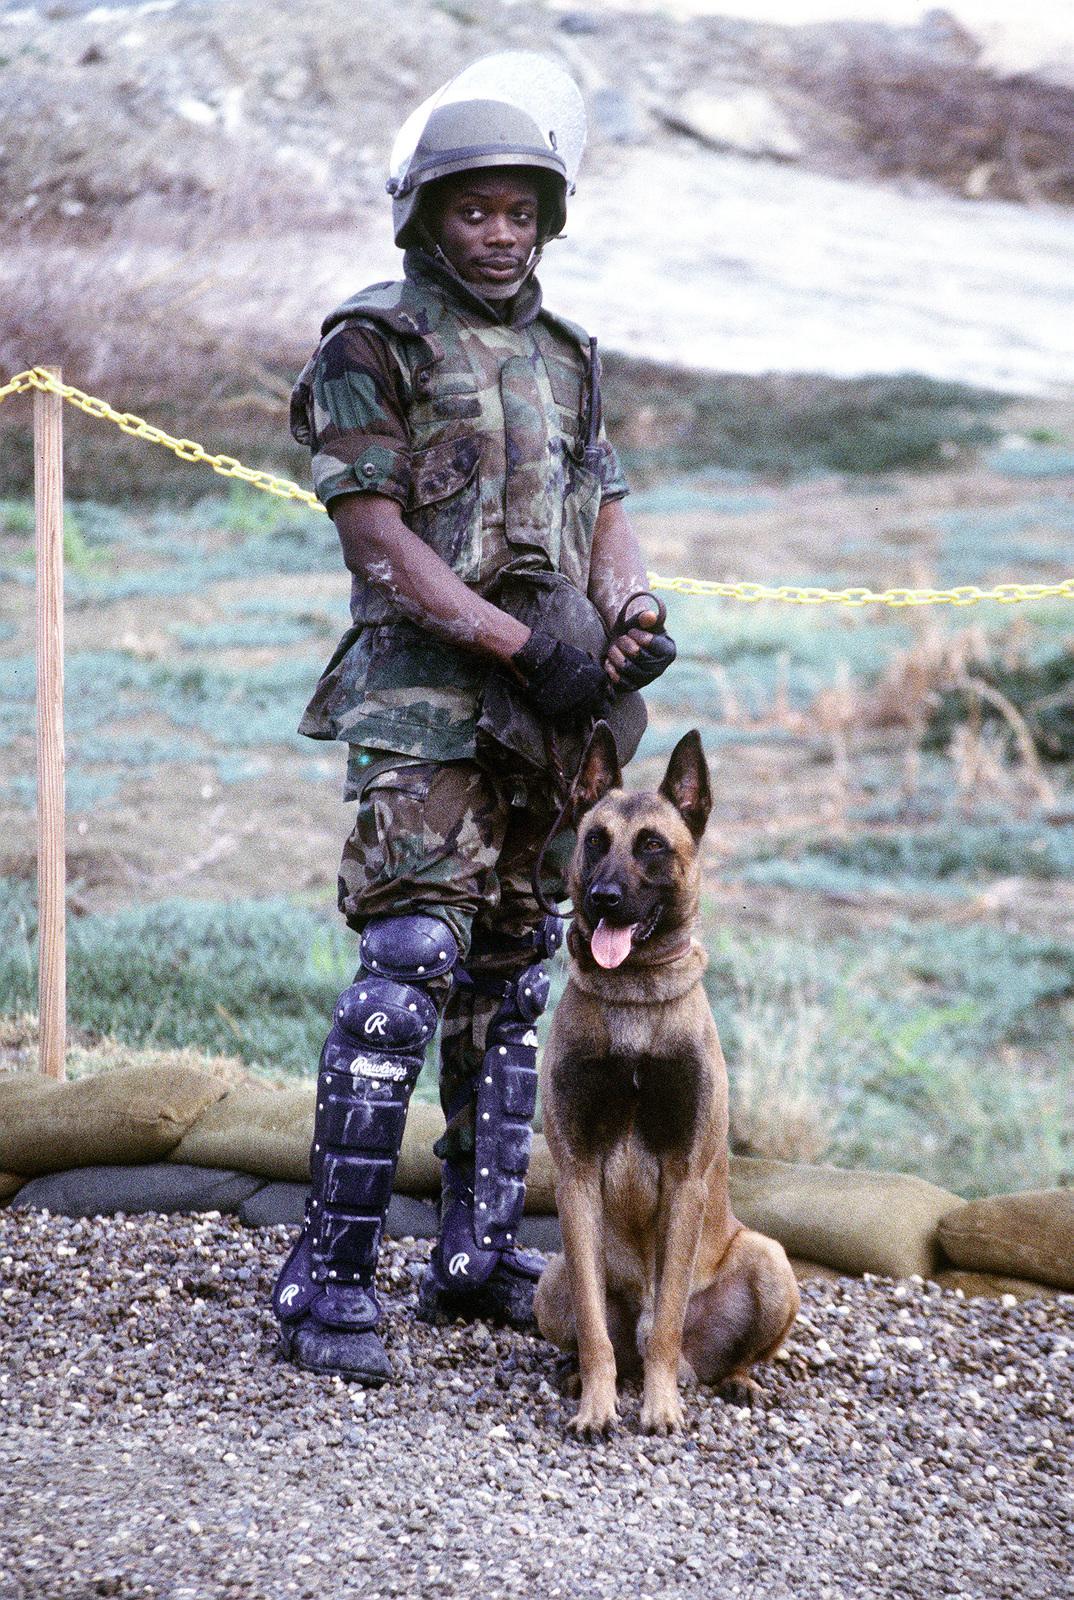 US Air Force Security Policeman AIRMAN Oswald stands with his guard dog at Camp X-ray at US Naval Base Guantanamo Bay, Cuba